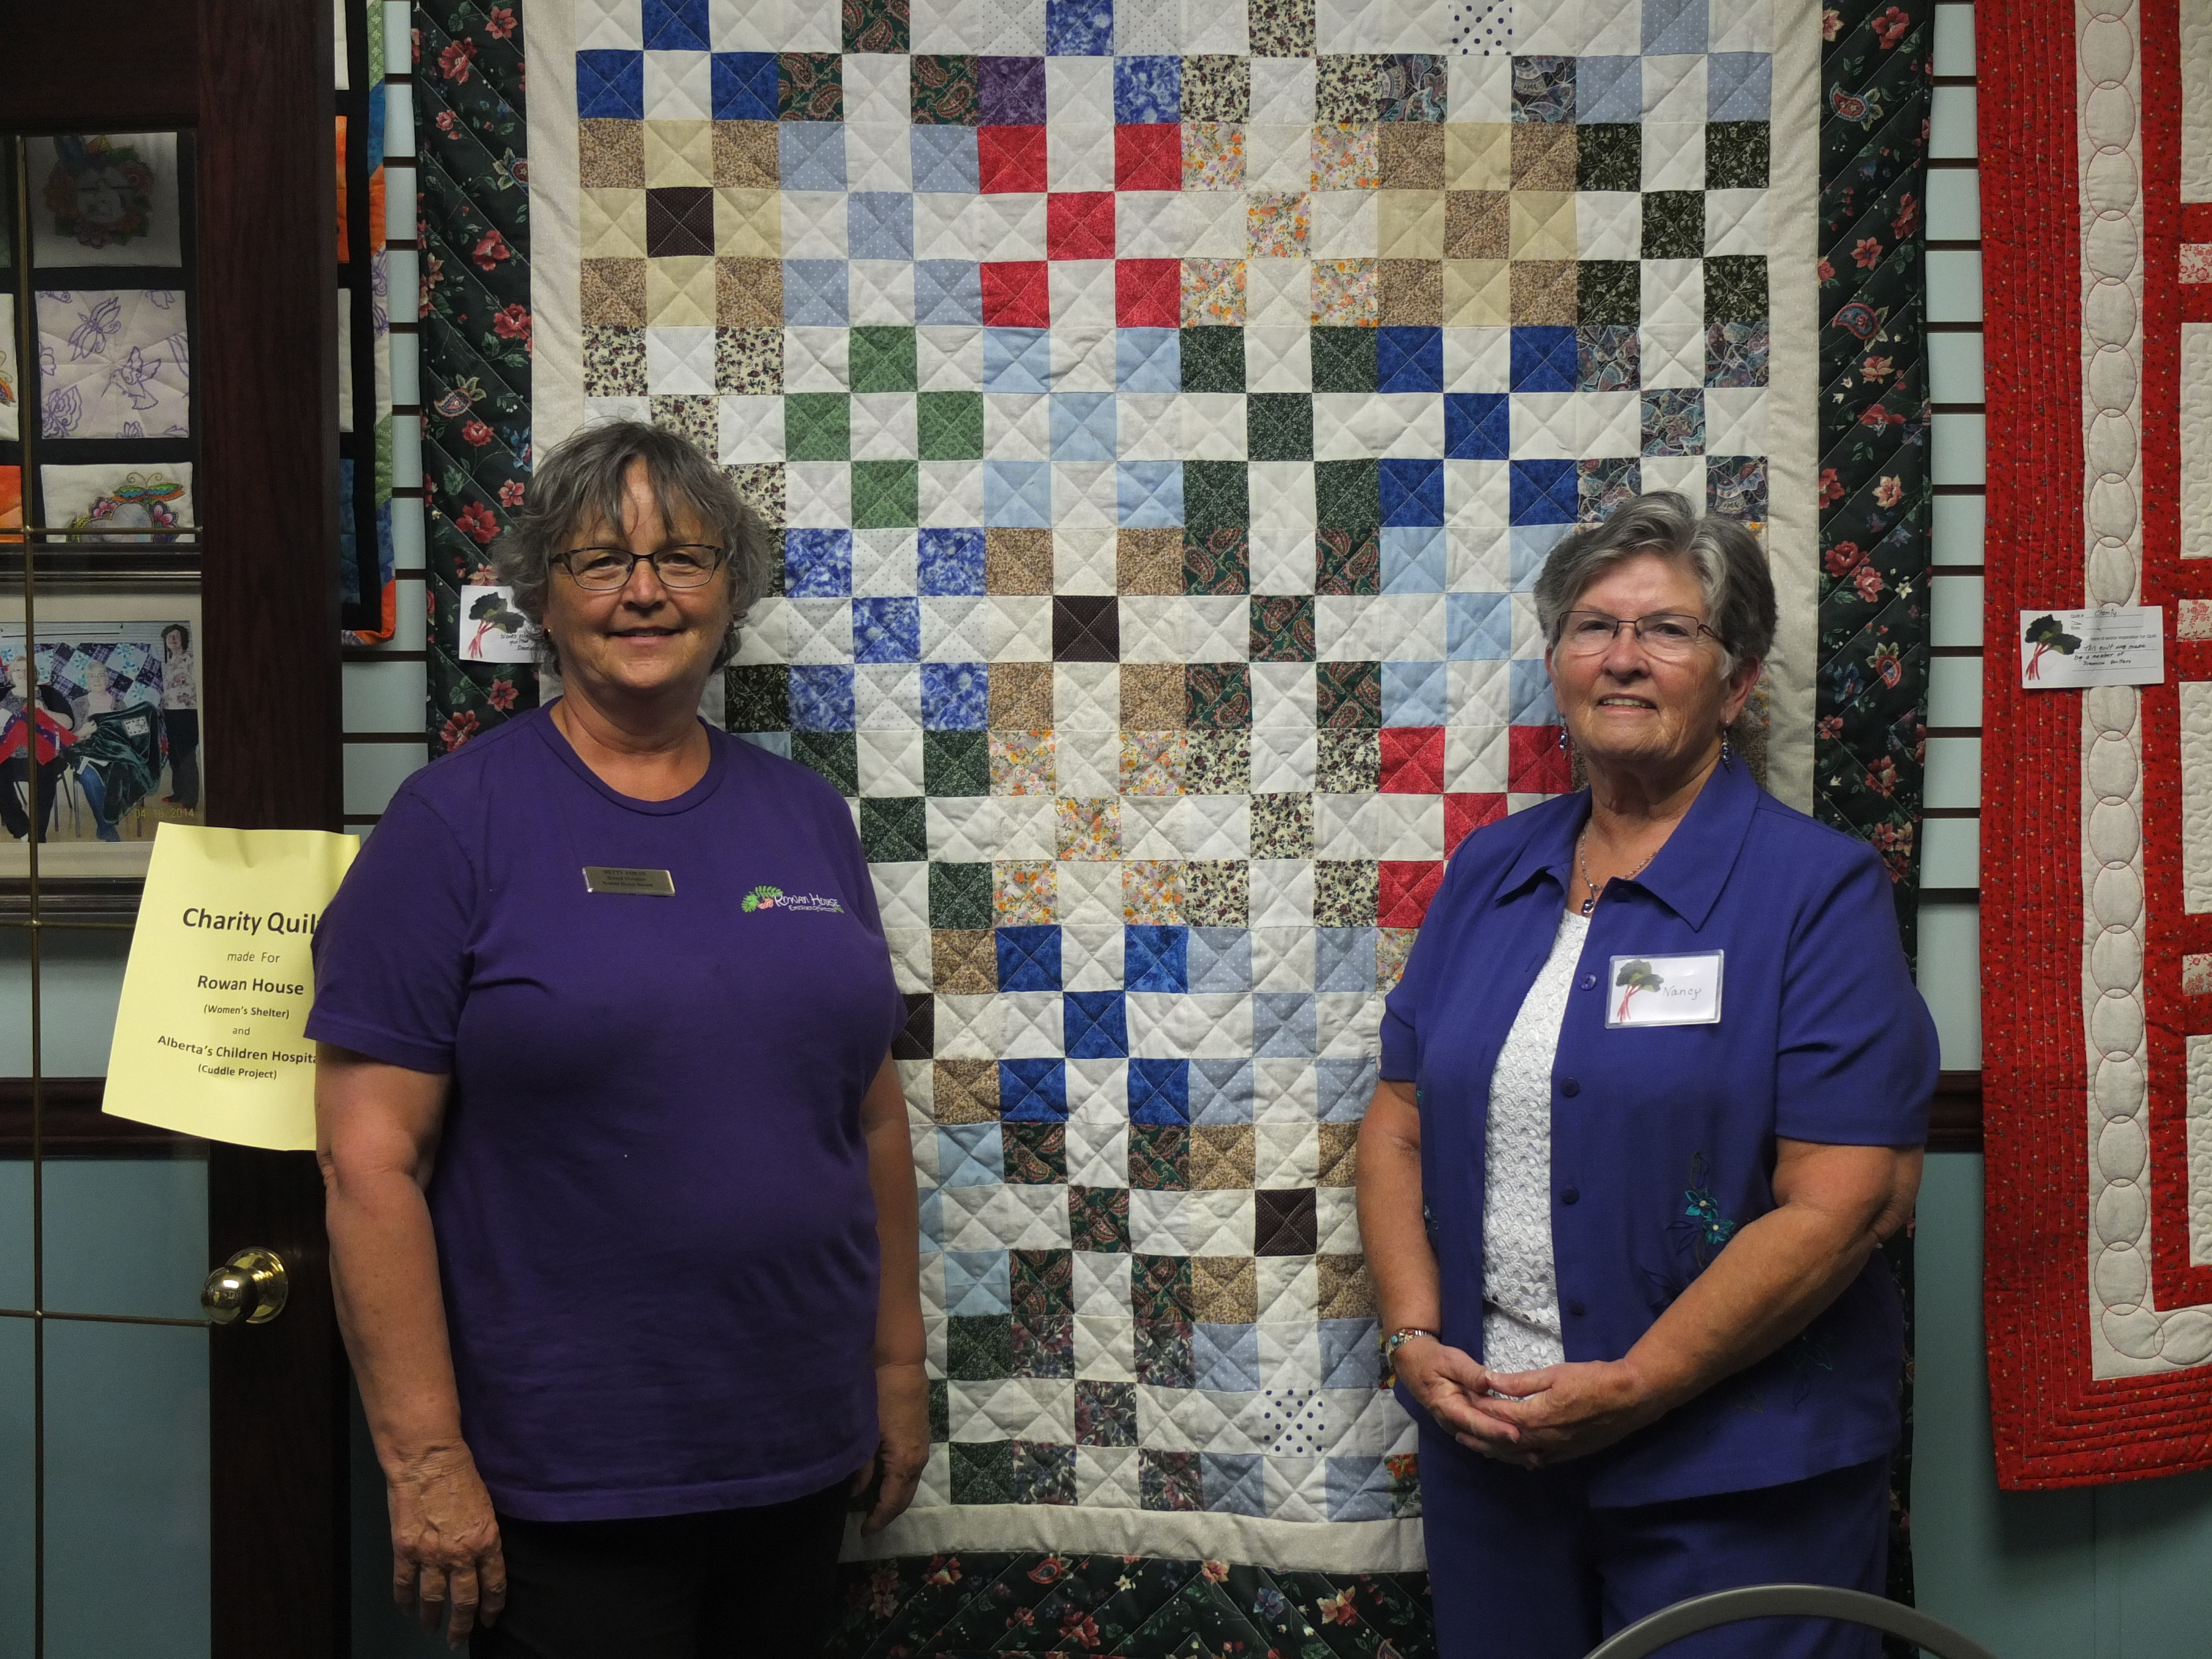 _quilt by Nancy Neufeld donated to Rowan House 2016DSCF5319